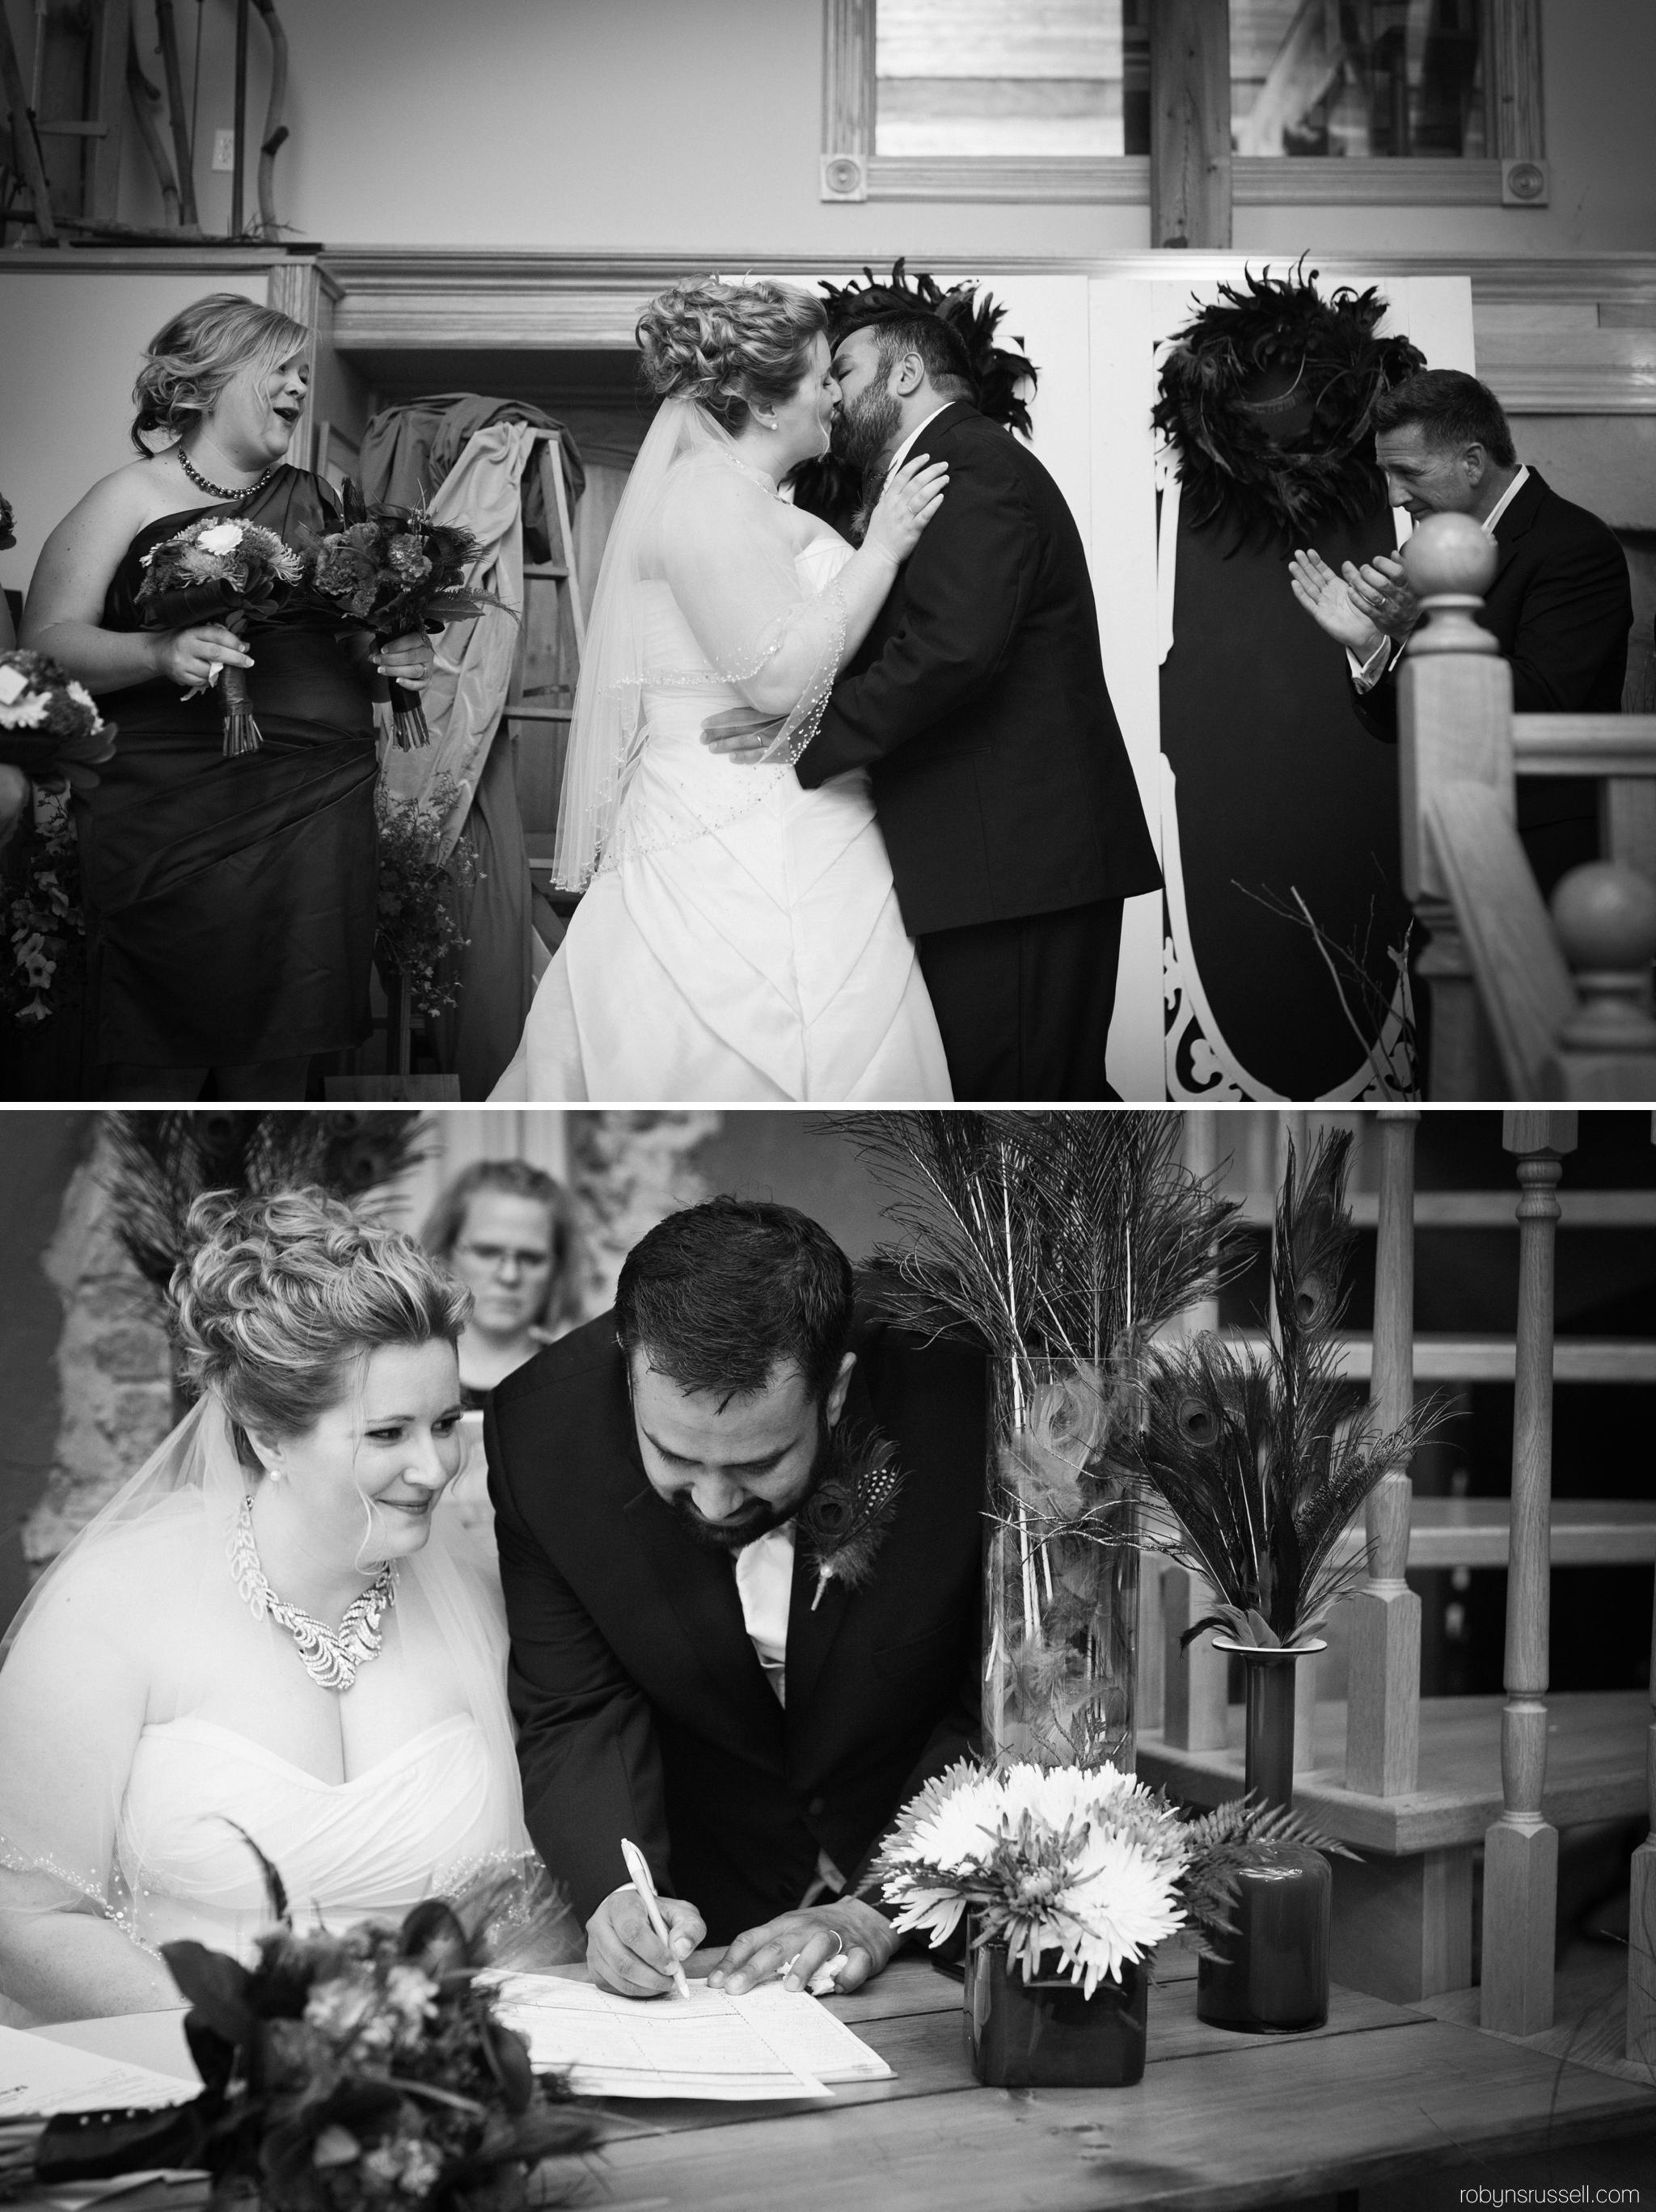 15-wedding-kiss-signing-registry-cambridge-wedding-photographer.jpg